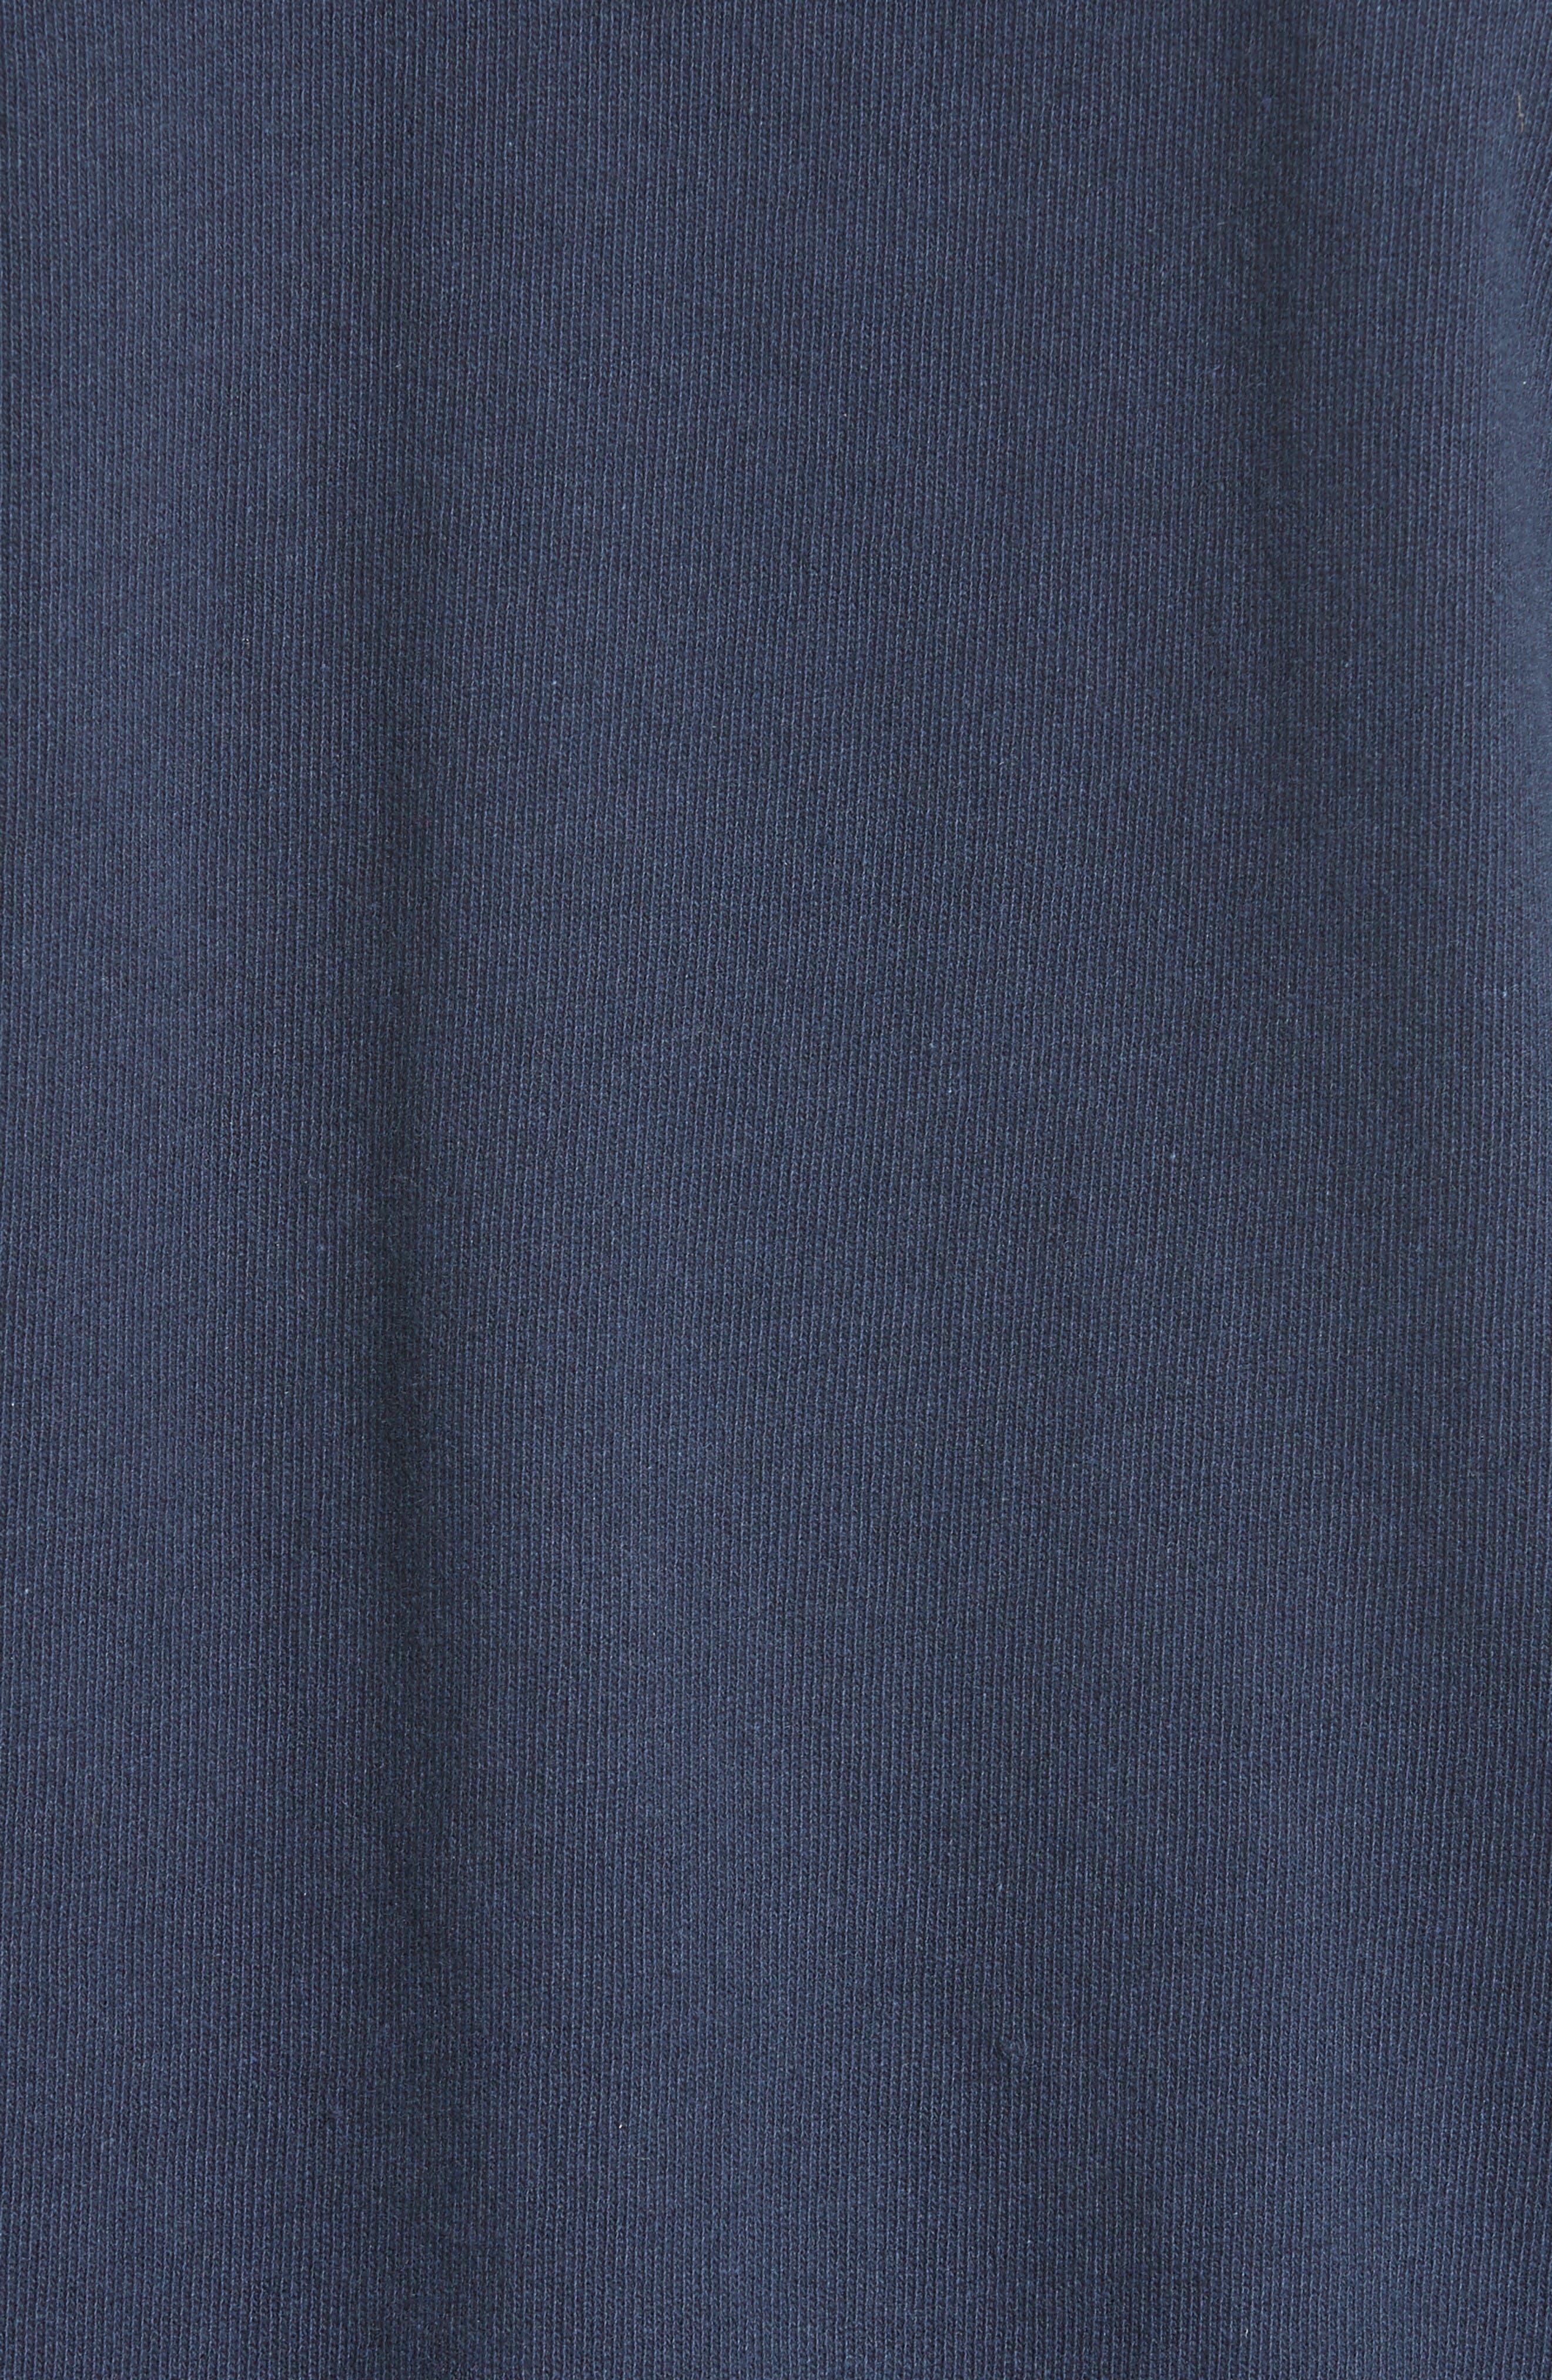 Hike Sweatshirt,                             Alternate thumbnail 5, color,                             Blue